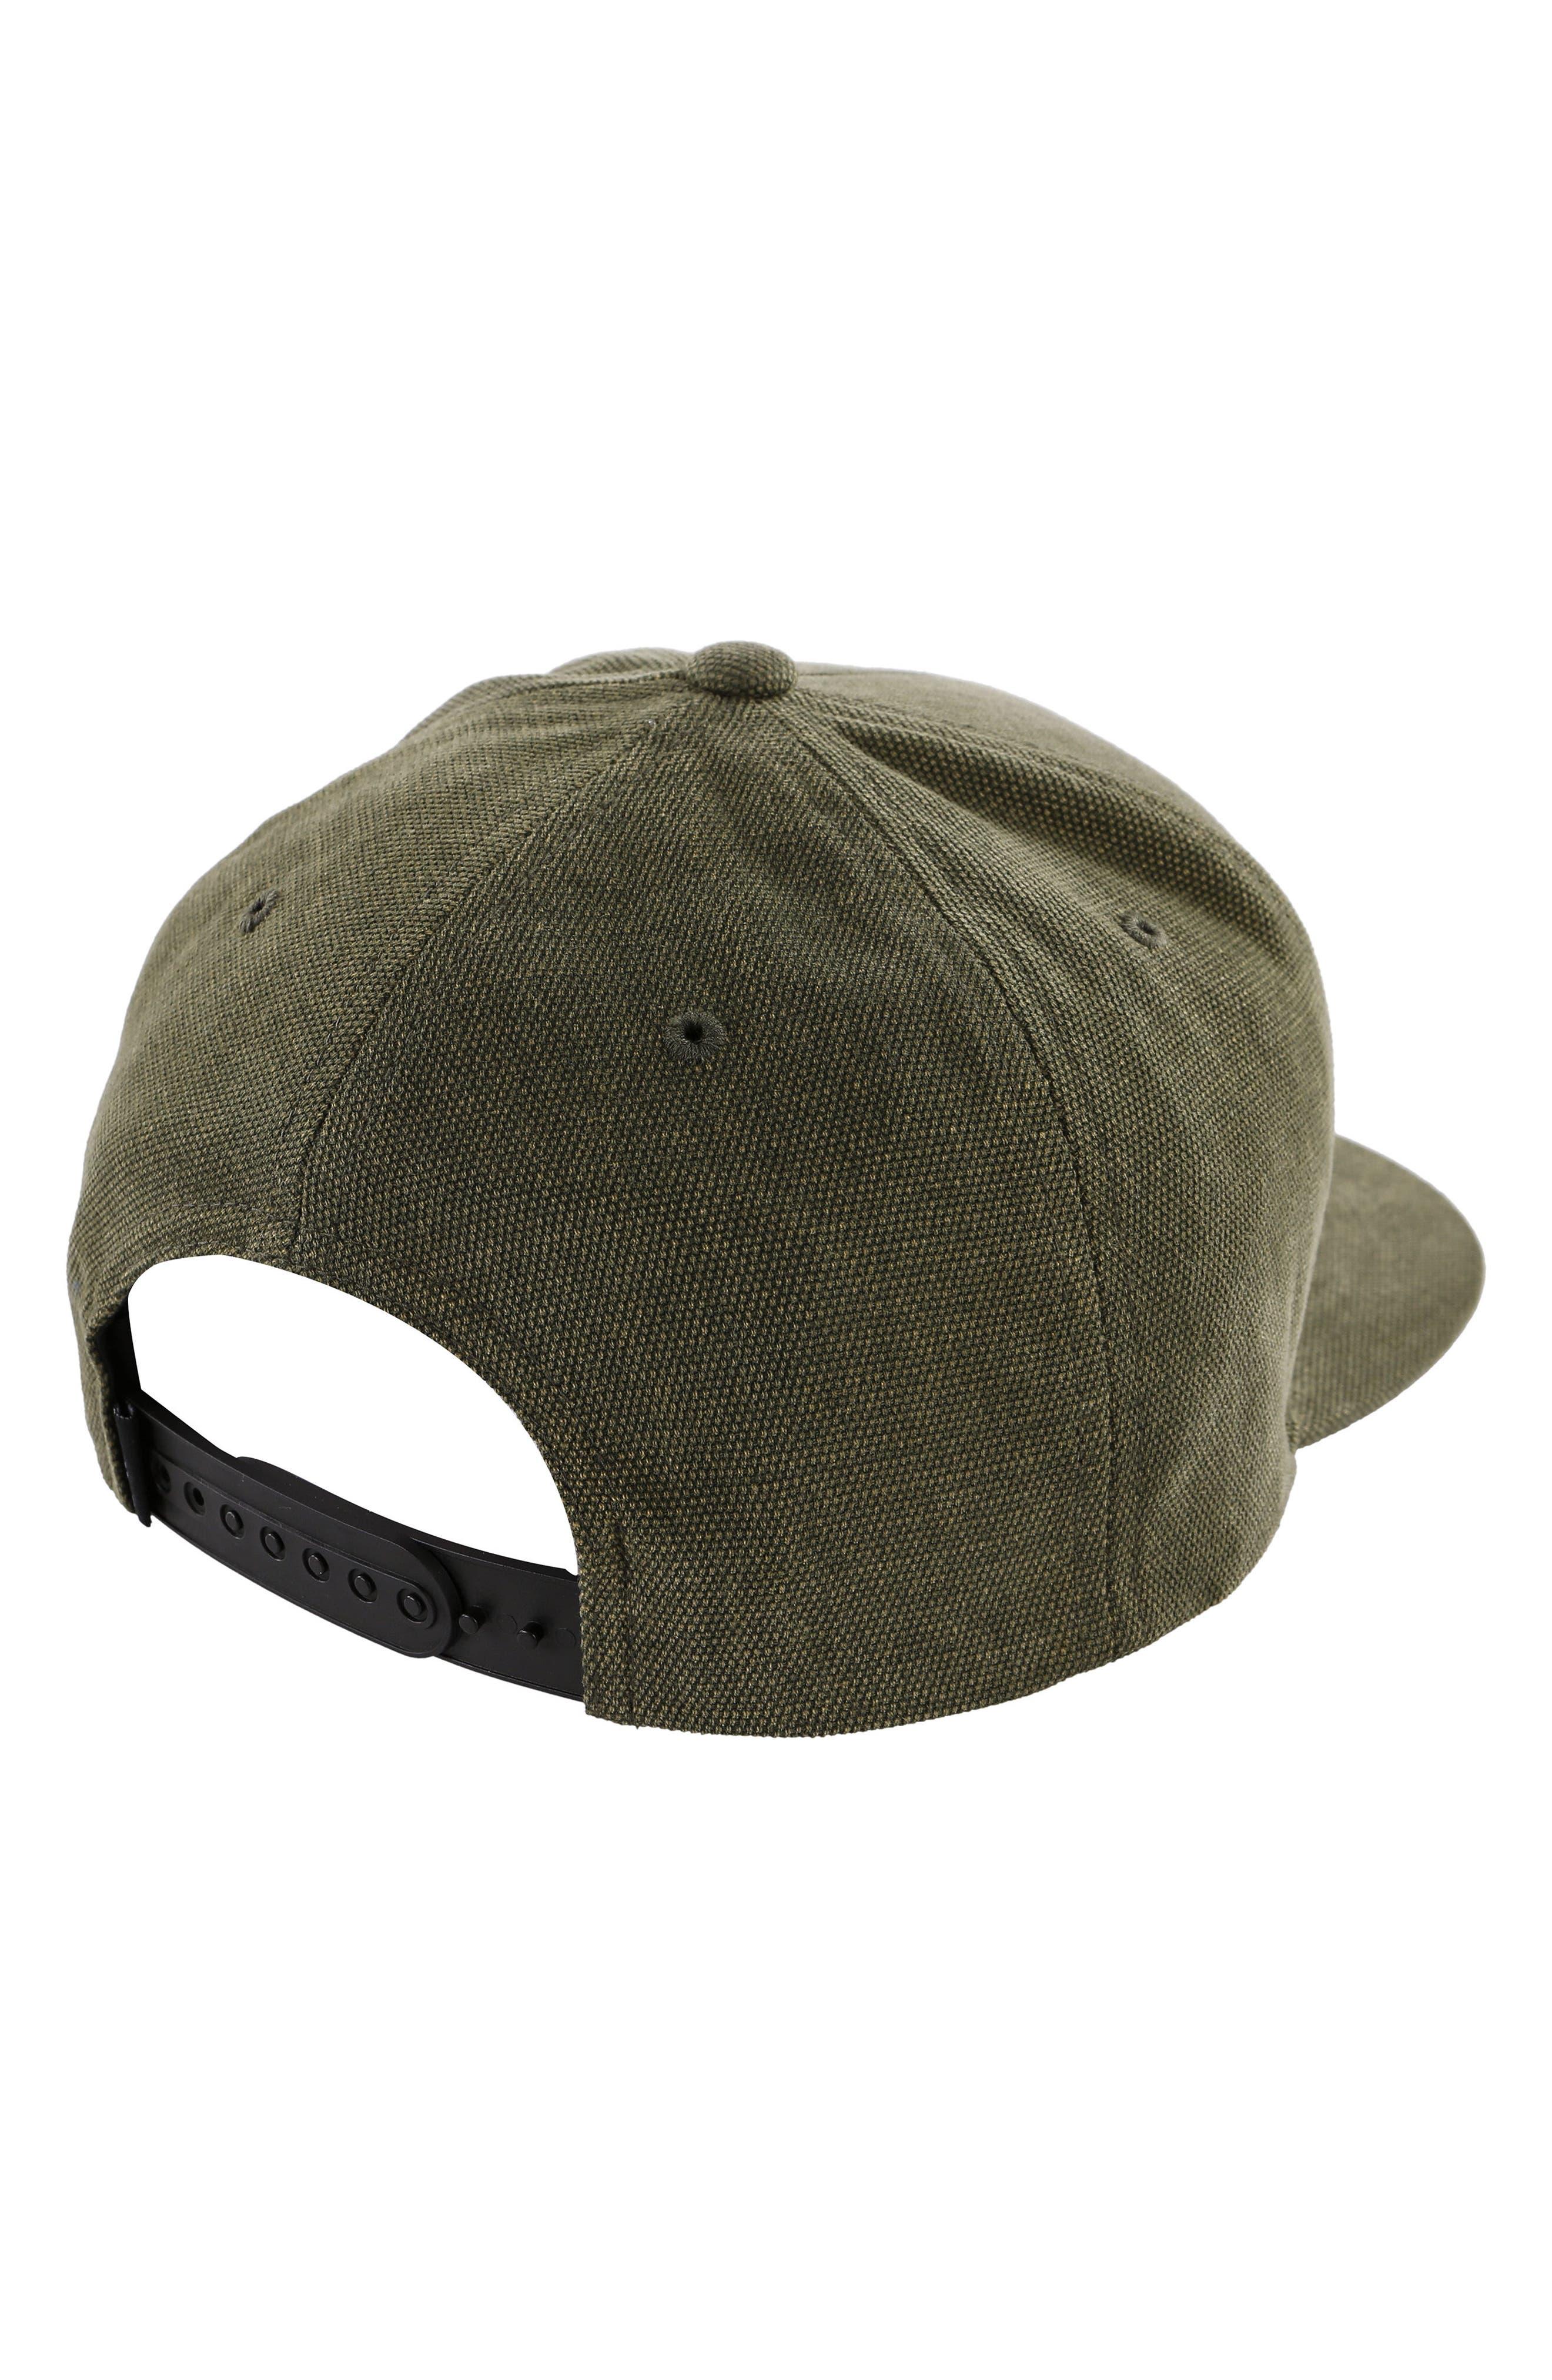 Lowtide Snapback Baseball Cap,                             Alternate thumbnail 2, color,                             Army